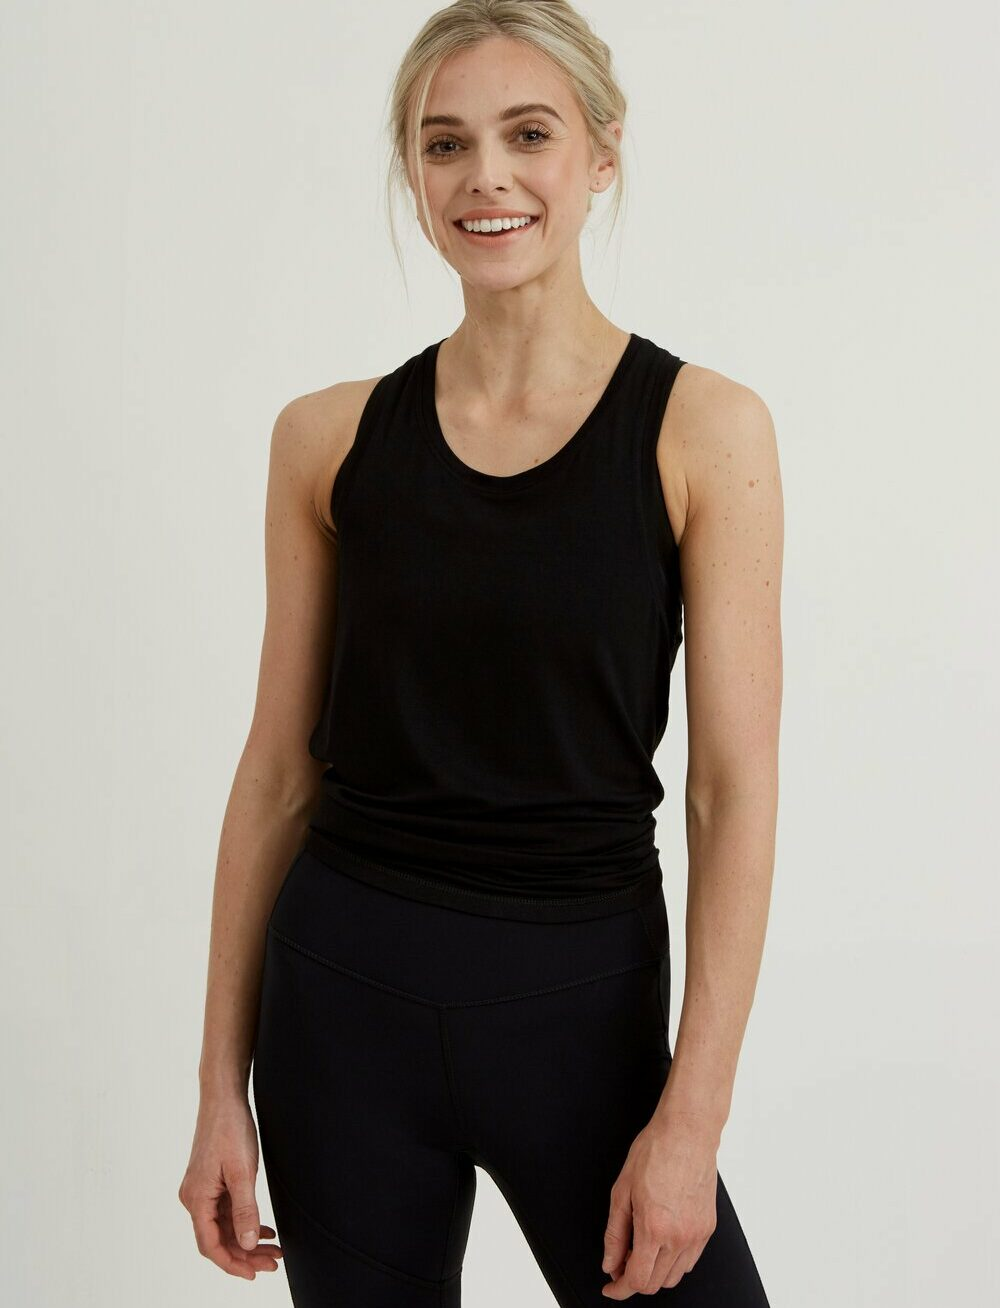 Sustainable Activewear Brands - SOS Activewear